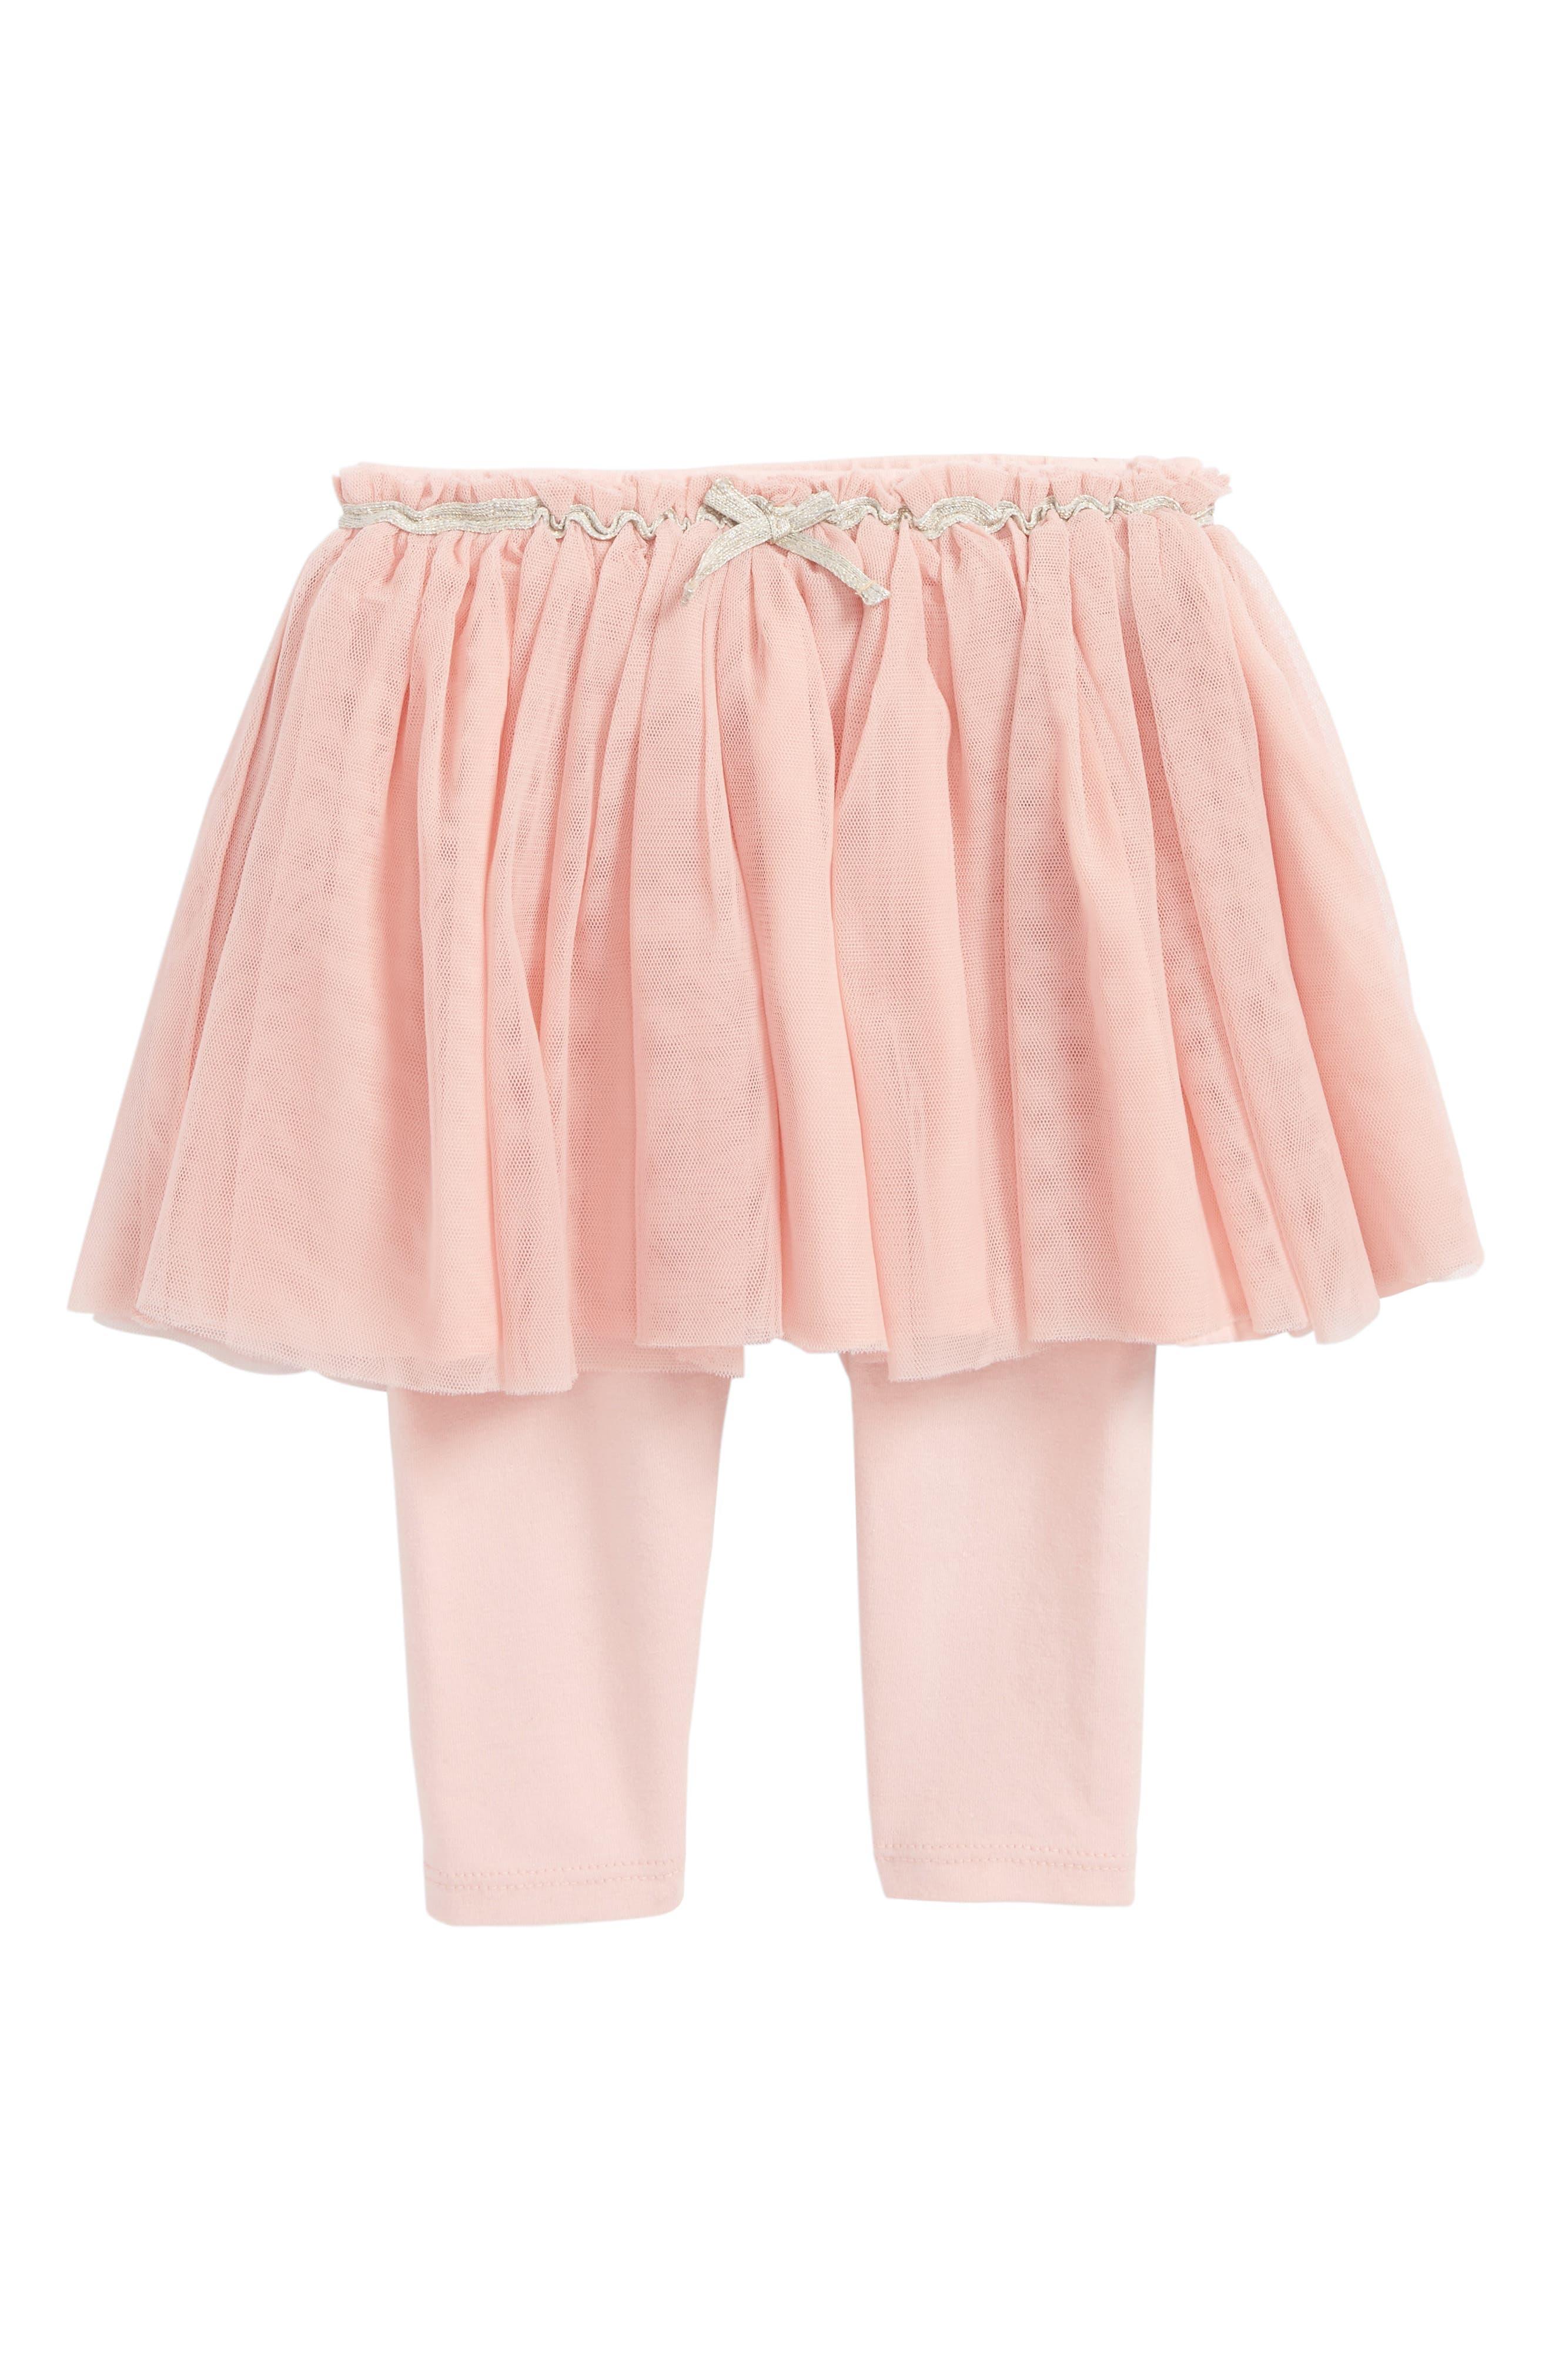 Tutu Leggings,                         Main,                         color,